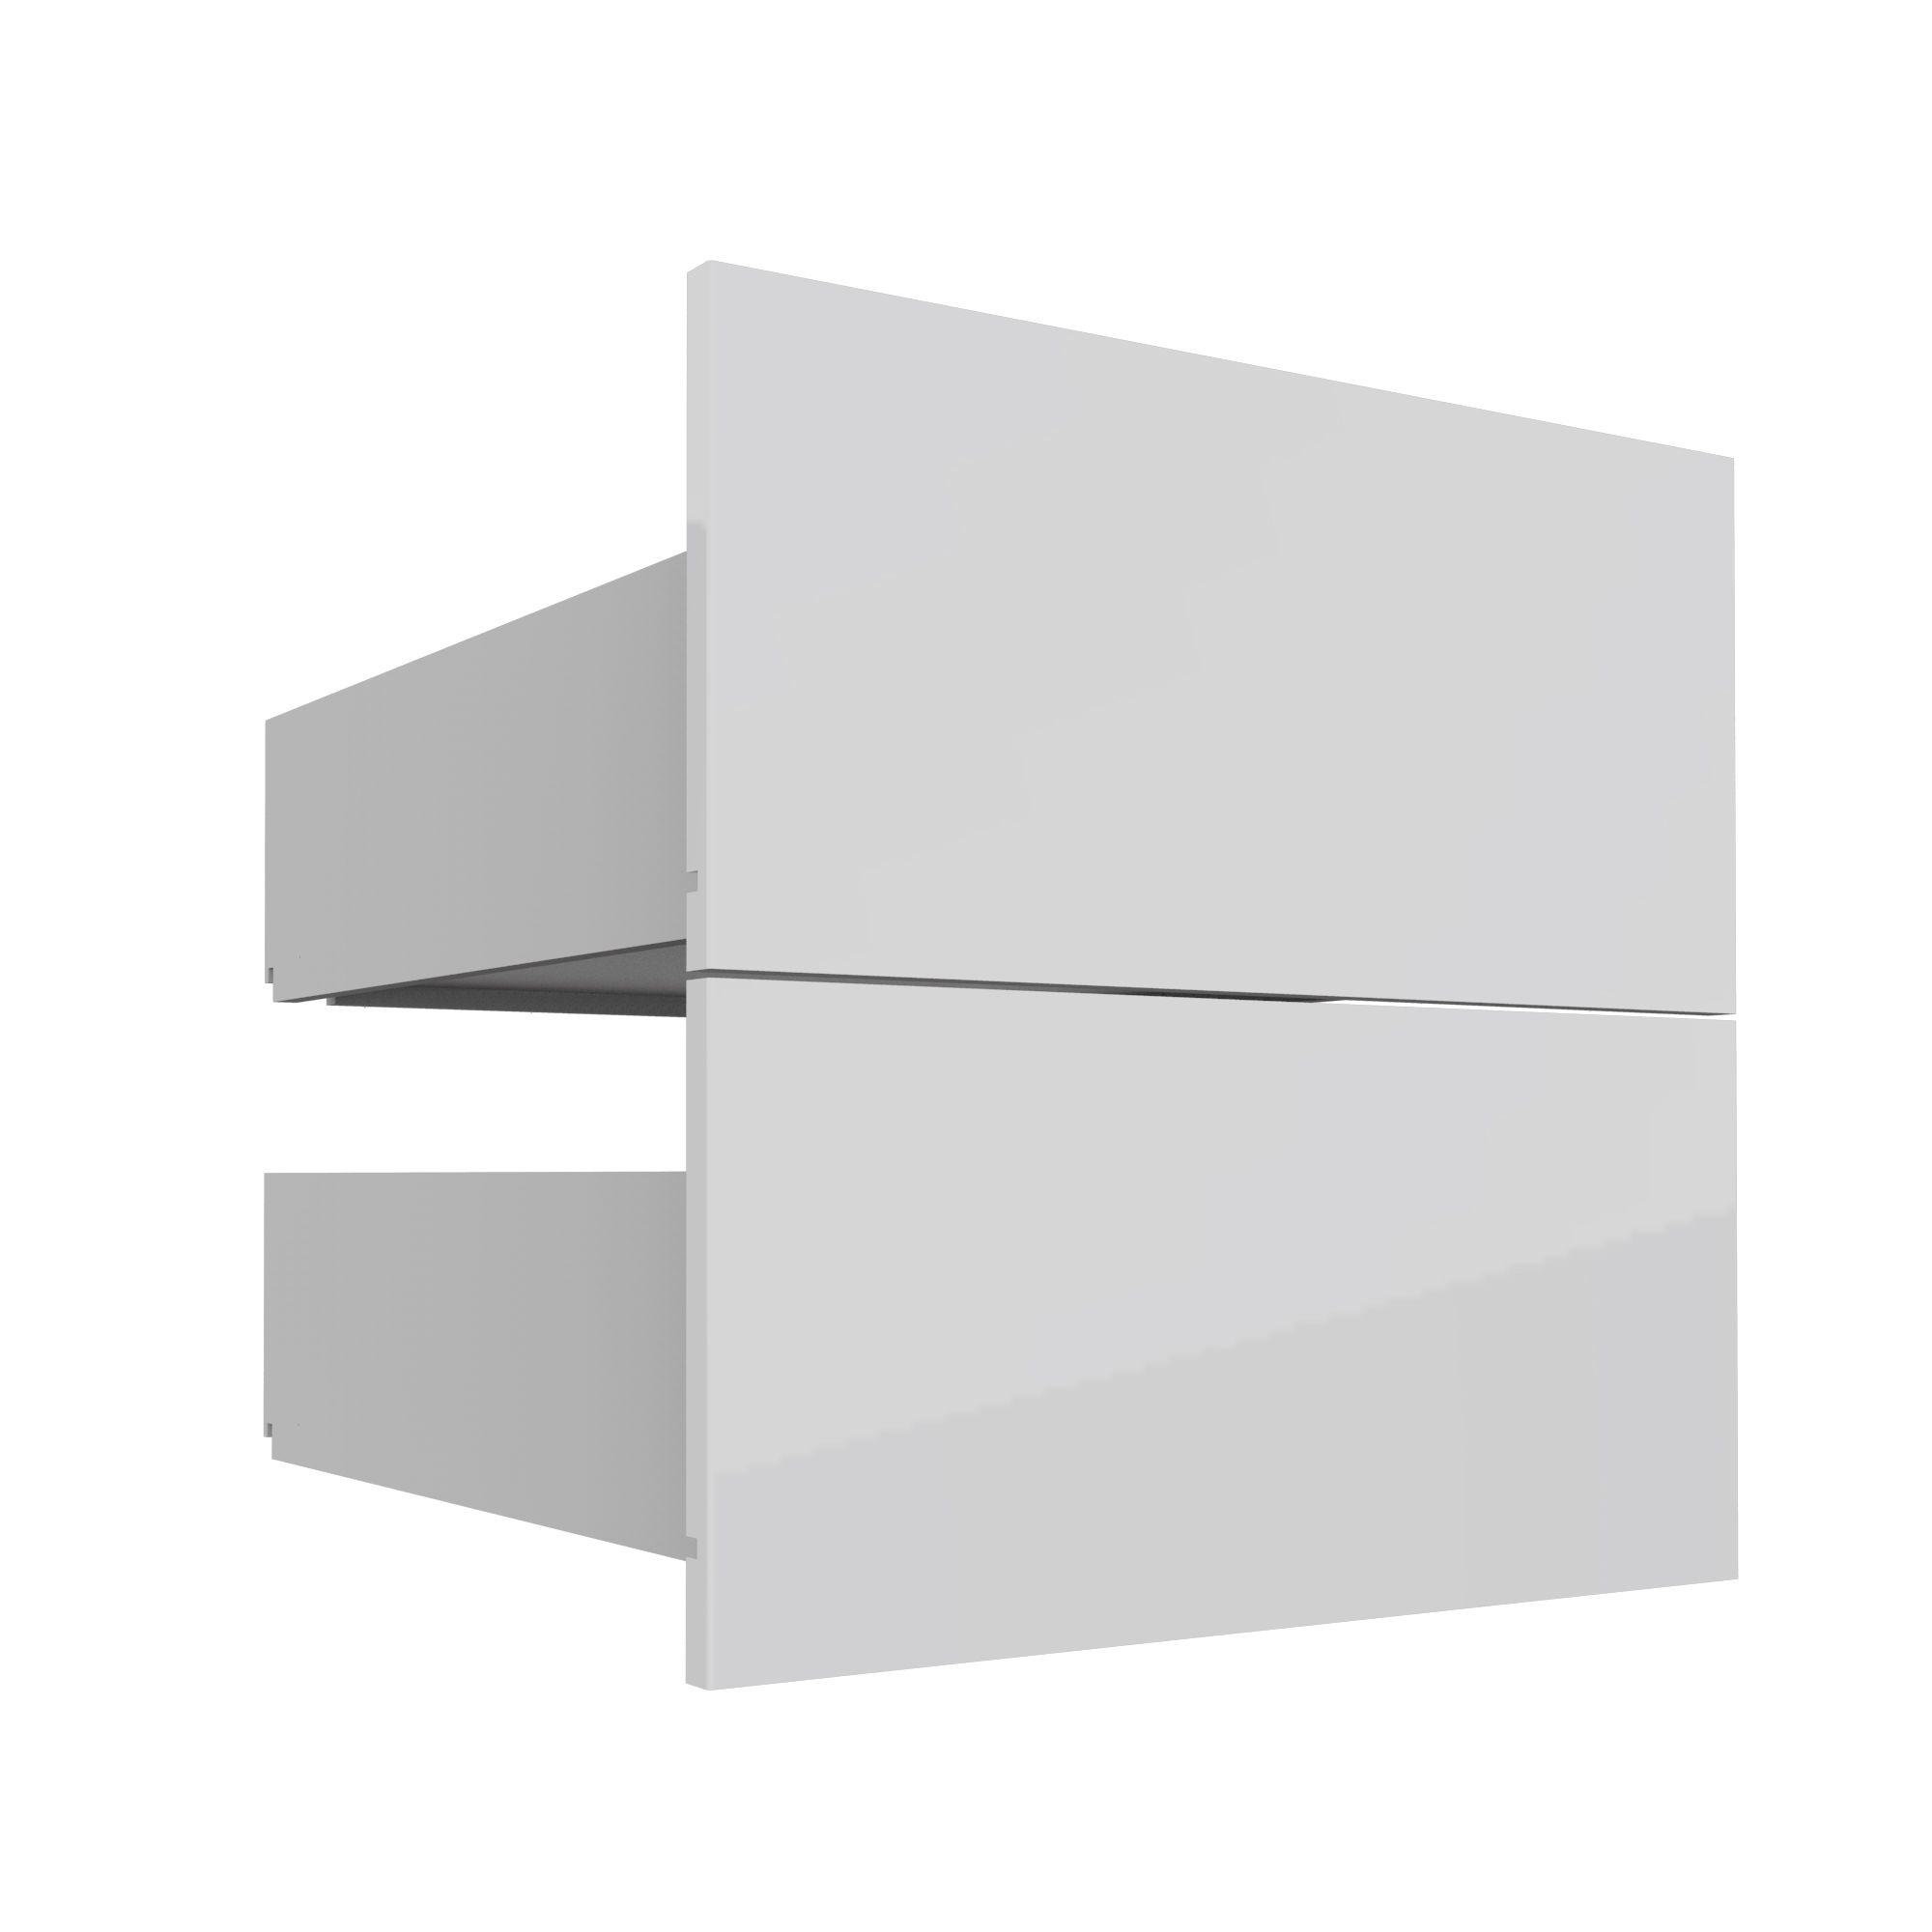 Darwin Modular White External Drawers (w) 500mm (d) 514mm, Pack Of 2